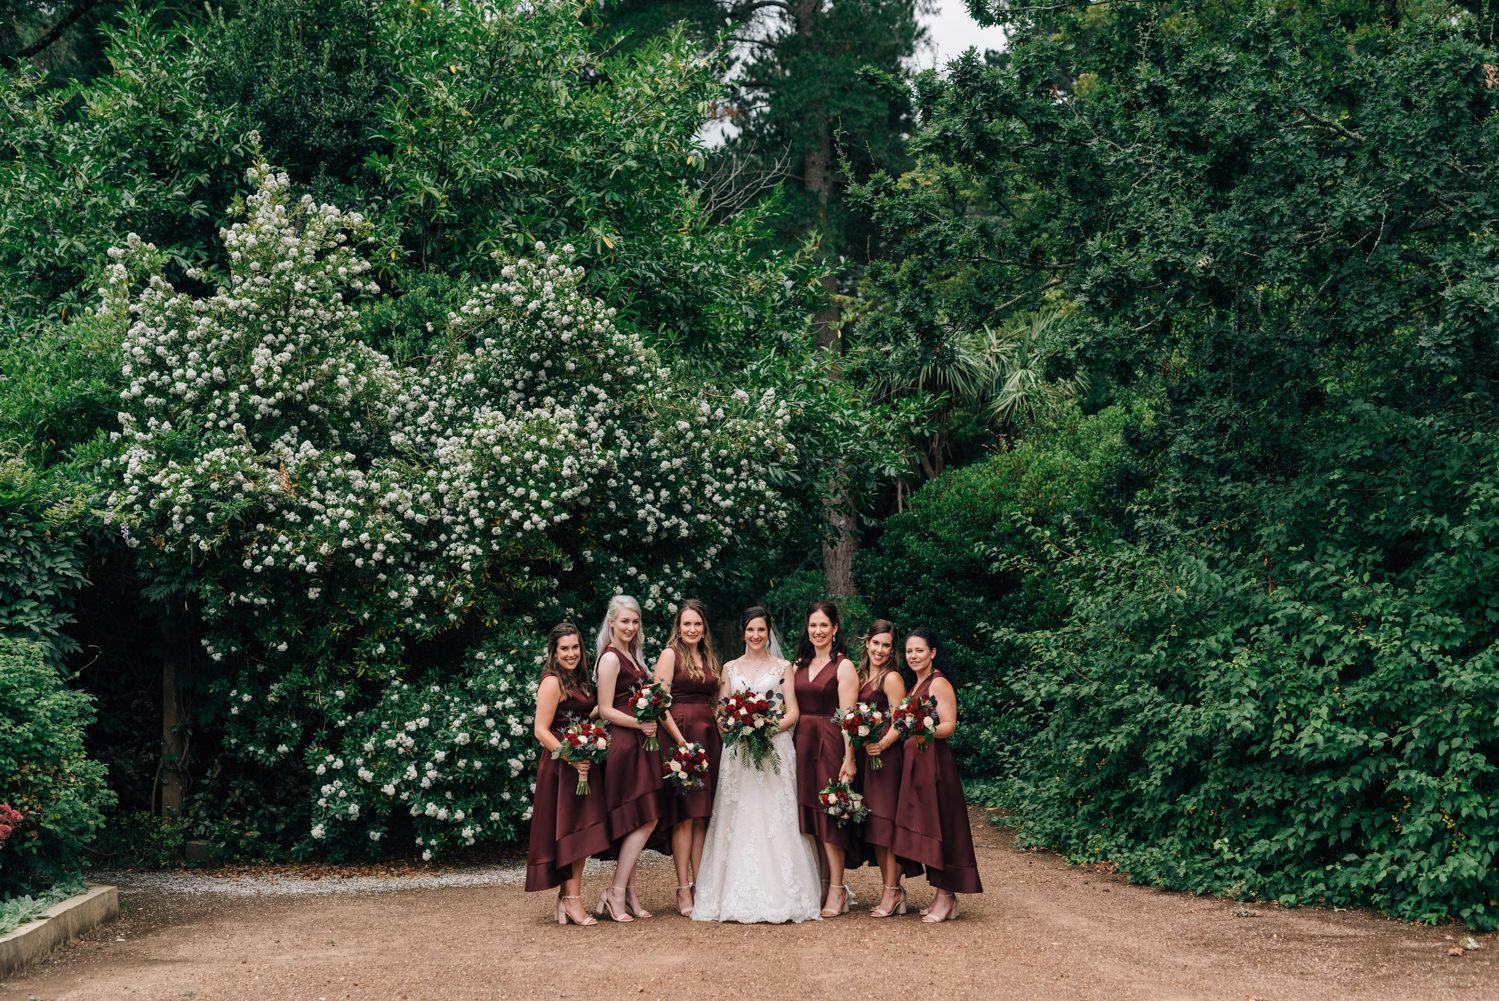 Brickendon-Wedding-Photographer-71.jpg